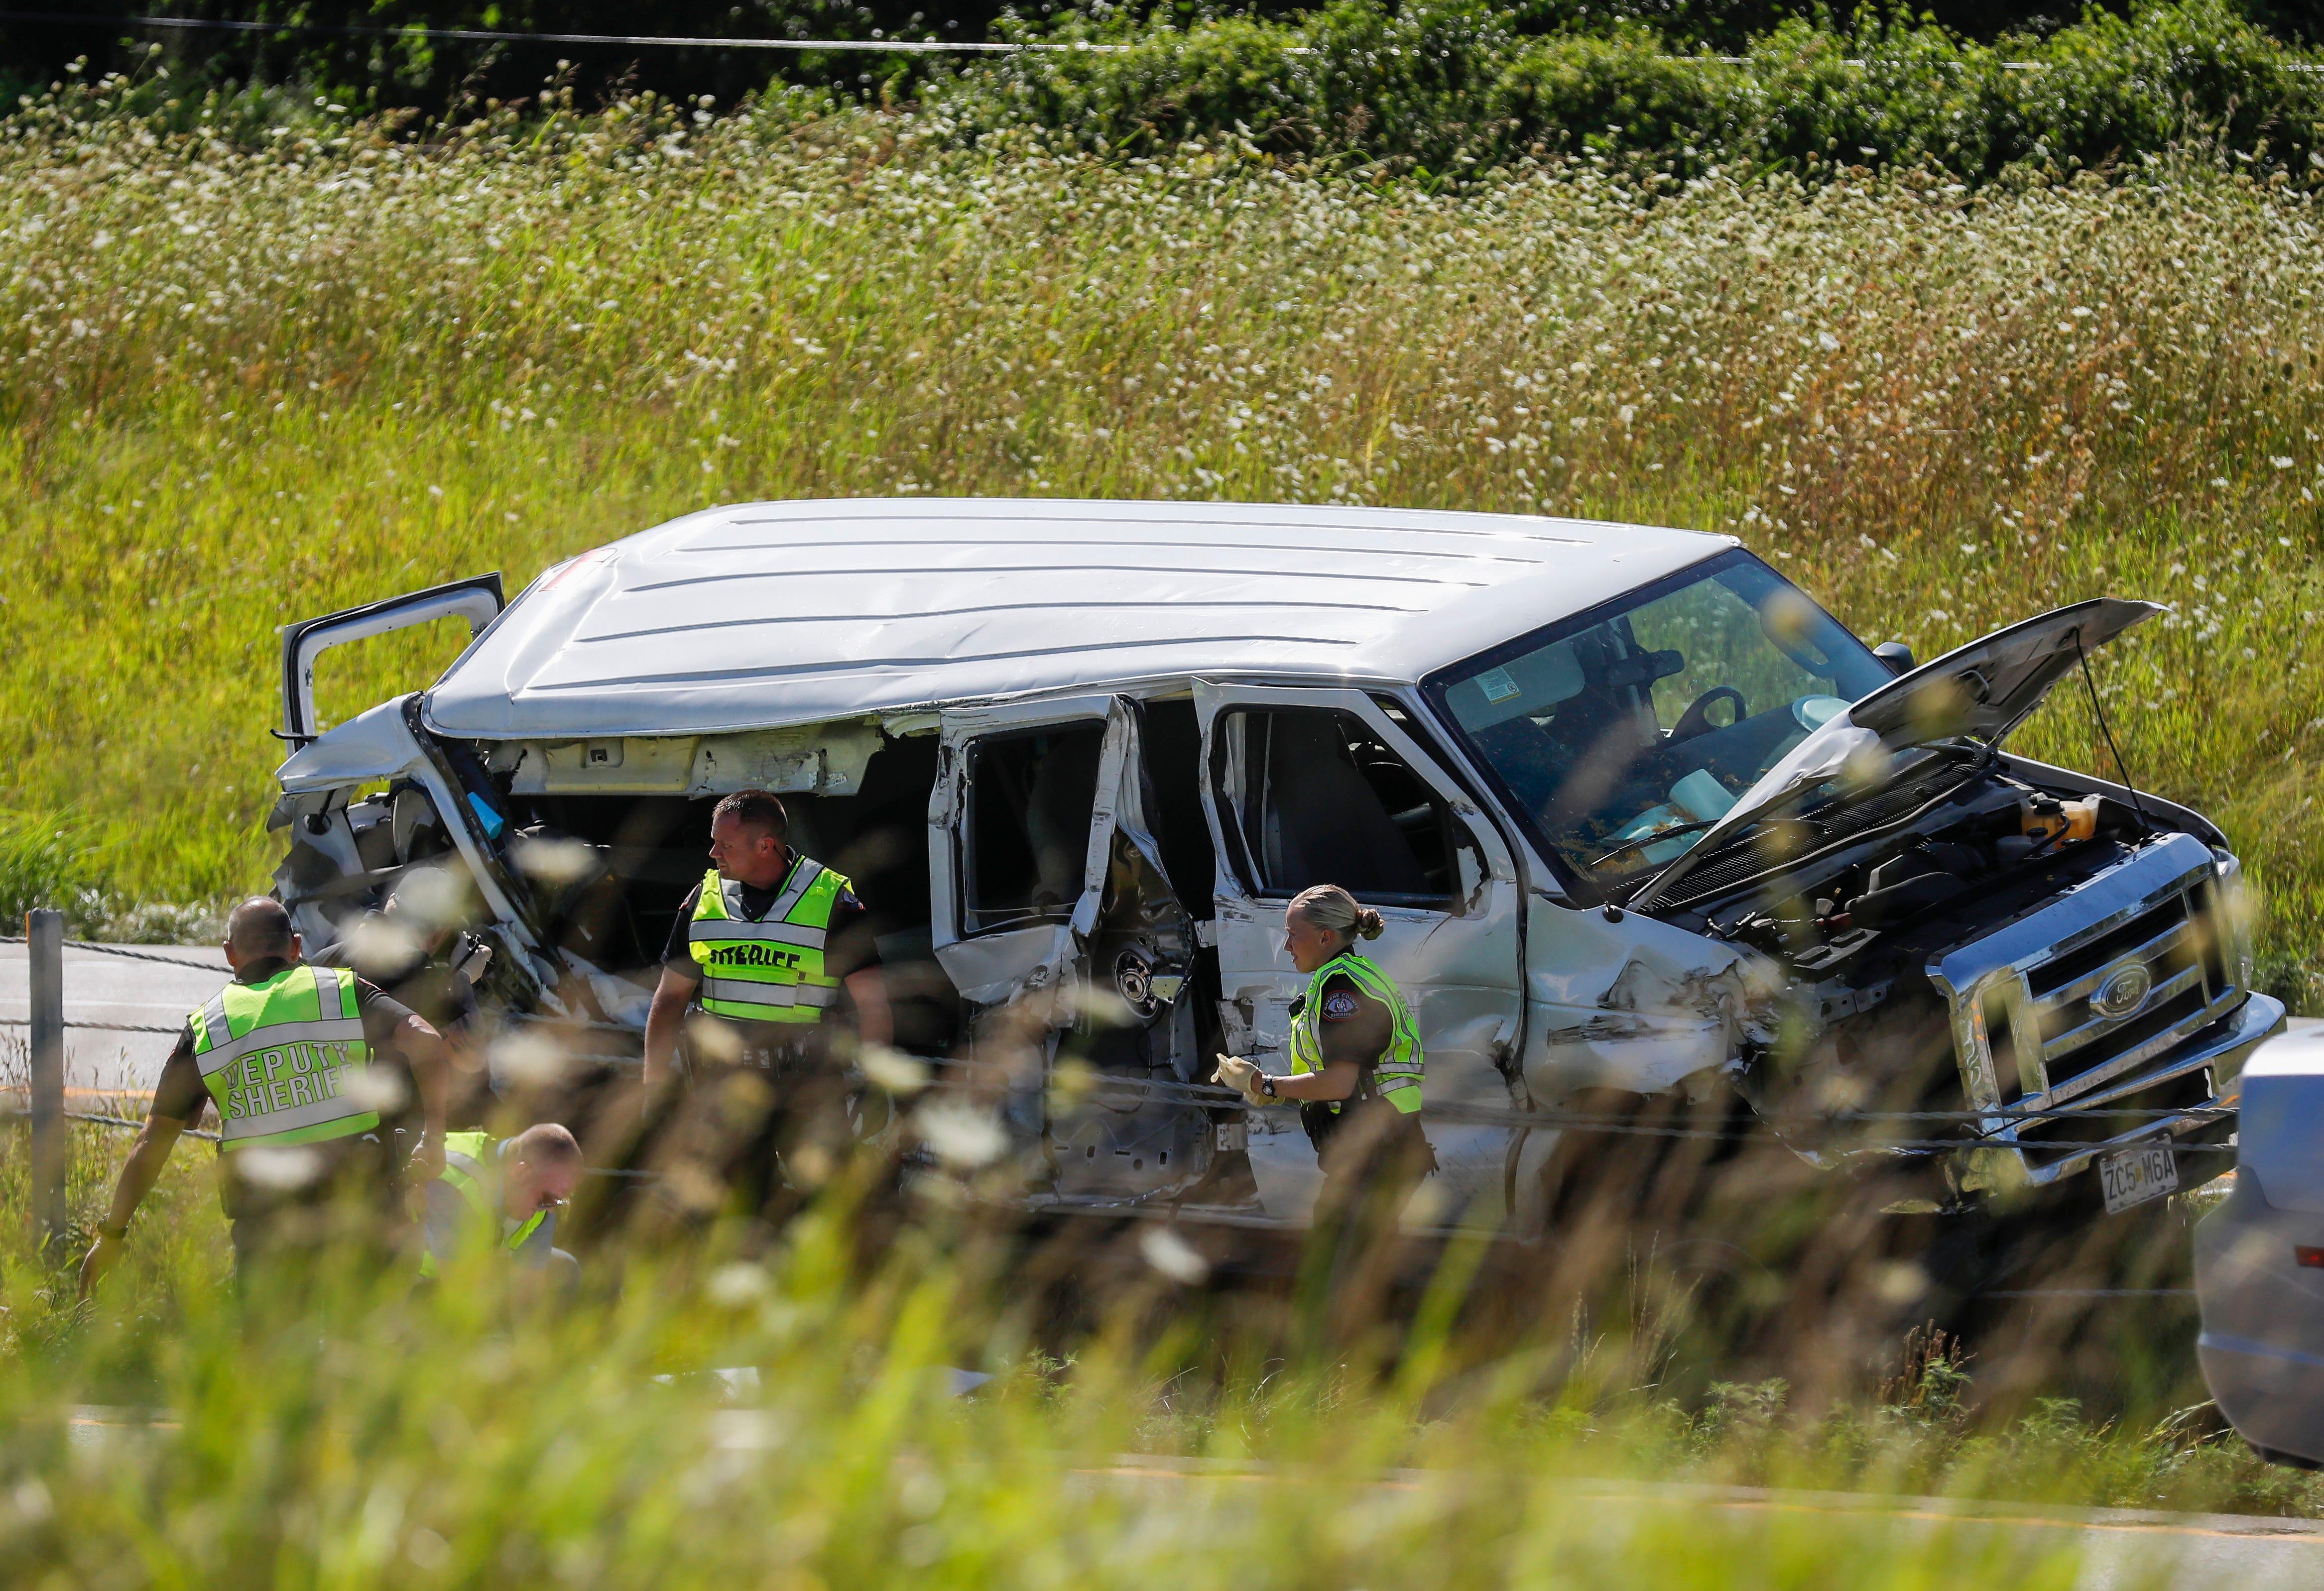 Drivers Sued In Greene County Crash That Killed Three Kids